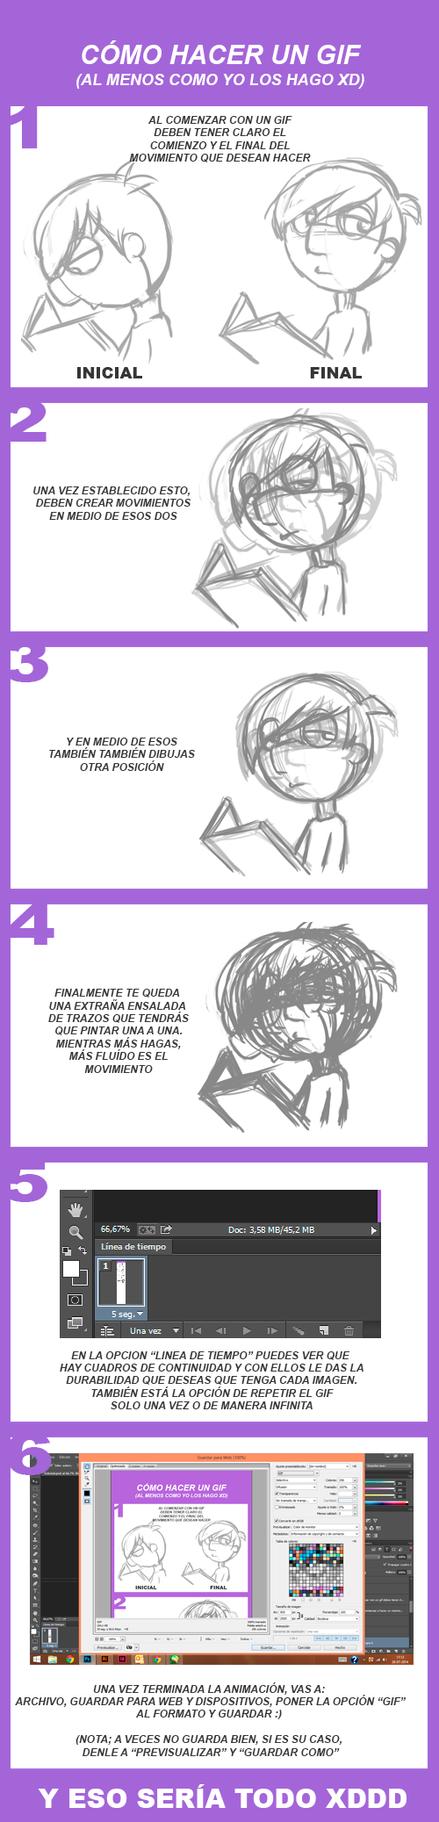 Como hacer un gif... mas o menos XD by Angelus19